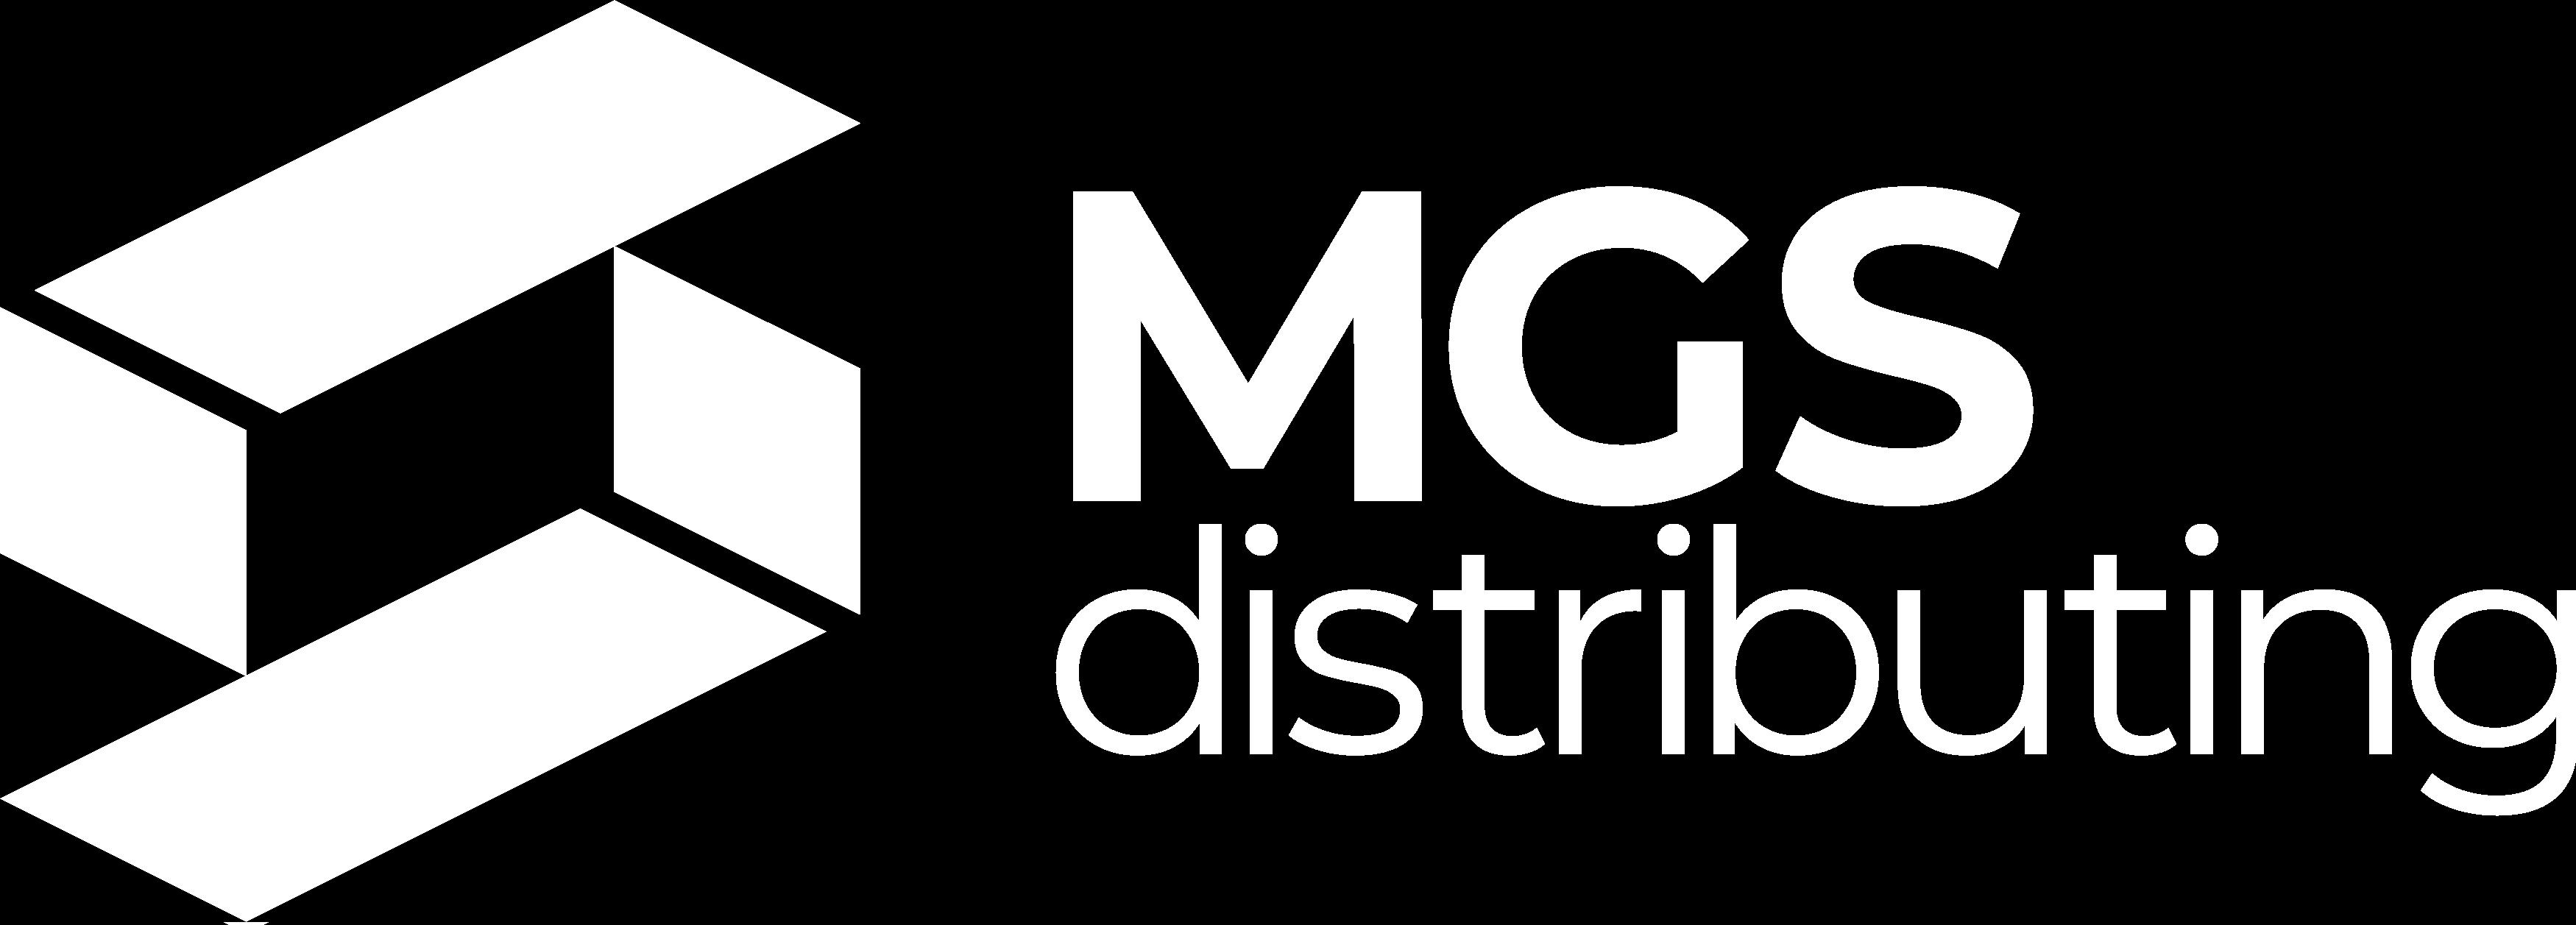 MGS Distributing Logo